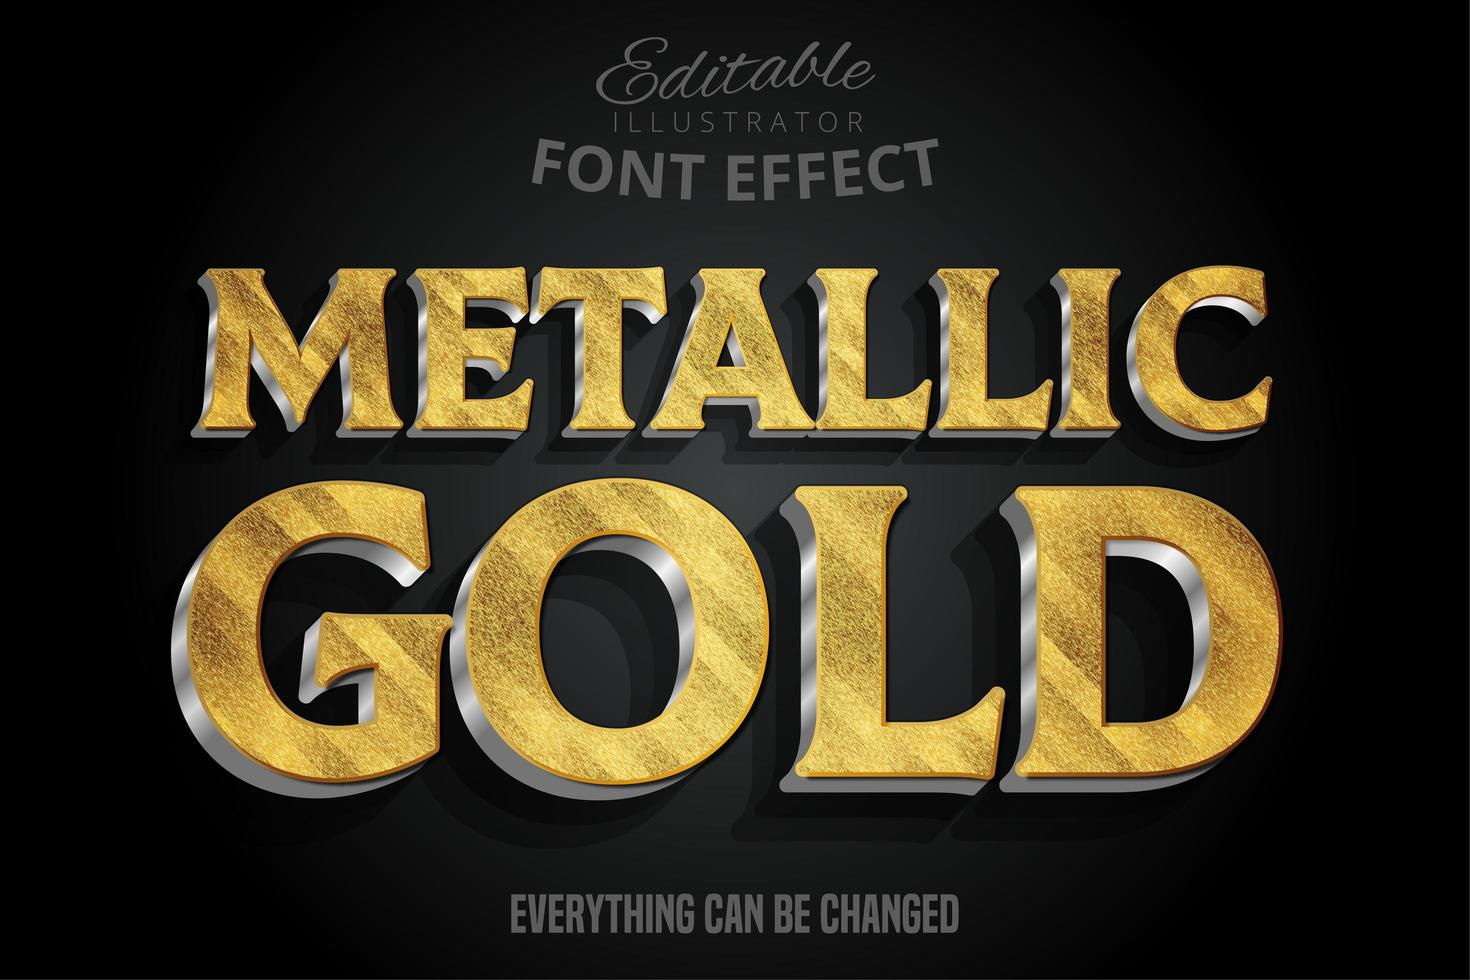 fonte 3d metálica ouro vetor